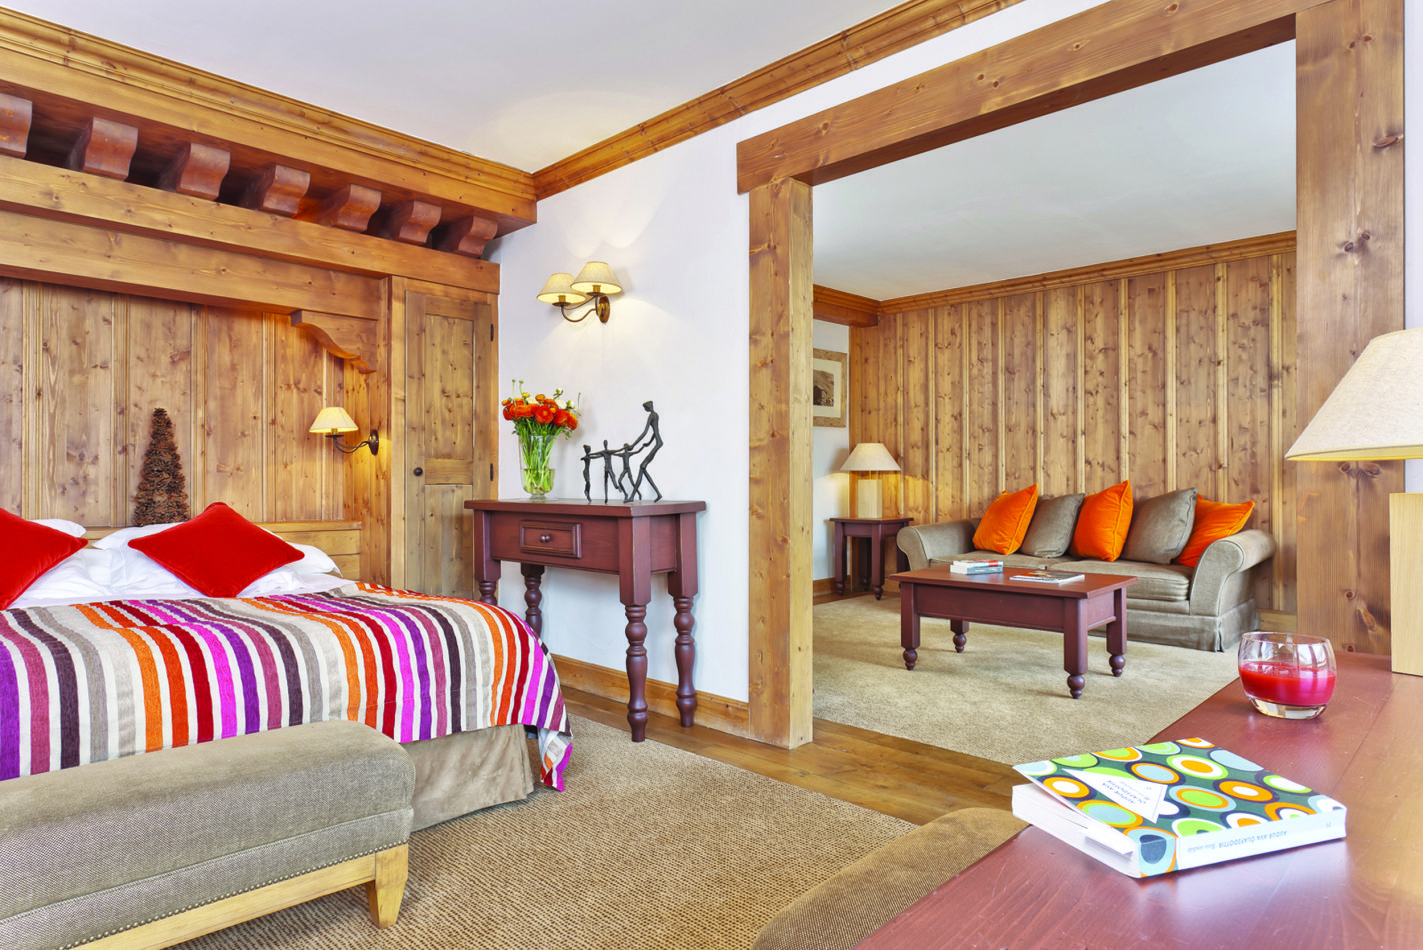 26-suite-prestige-chalet-dalpage-prestige-suite-alpine-ch